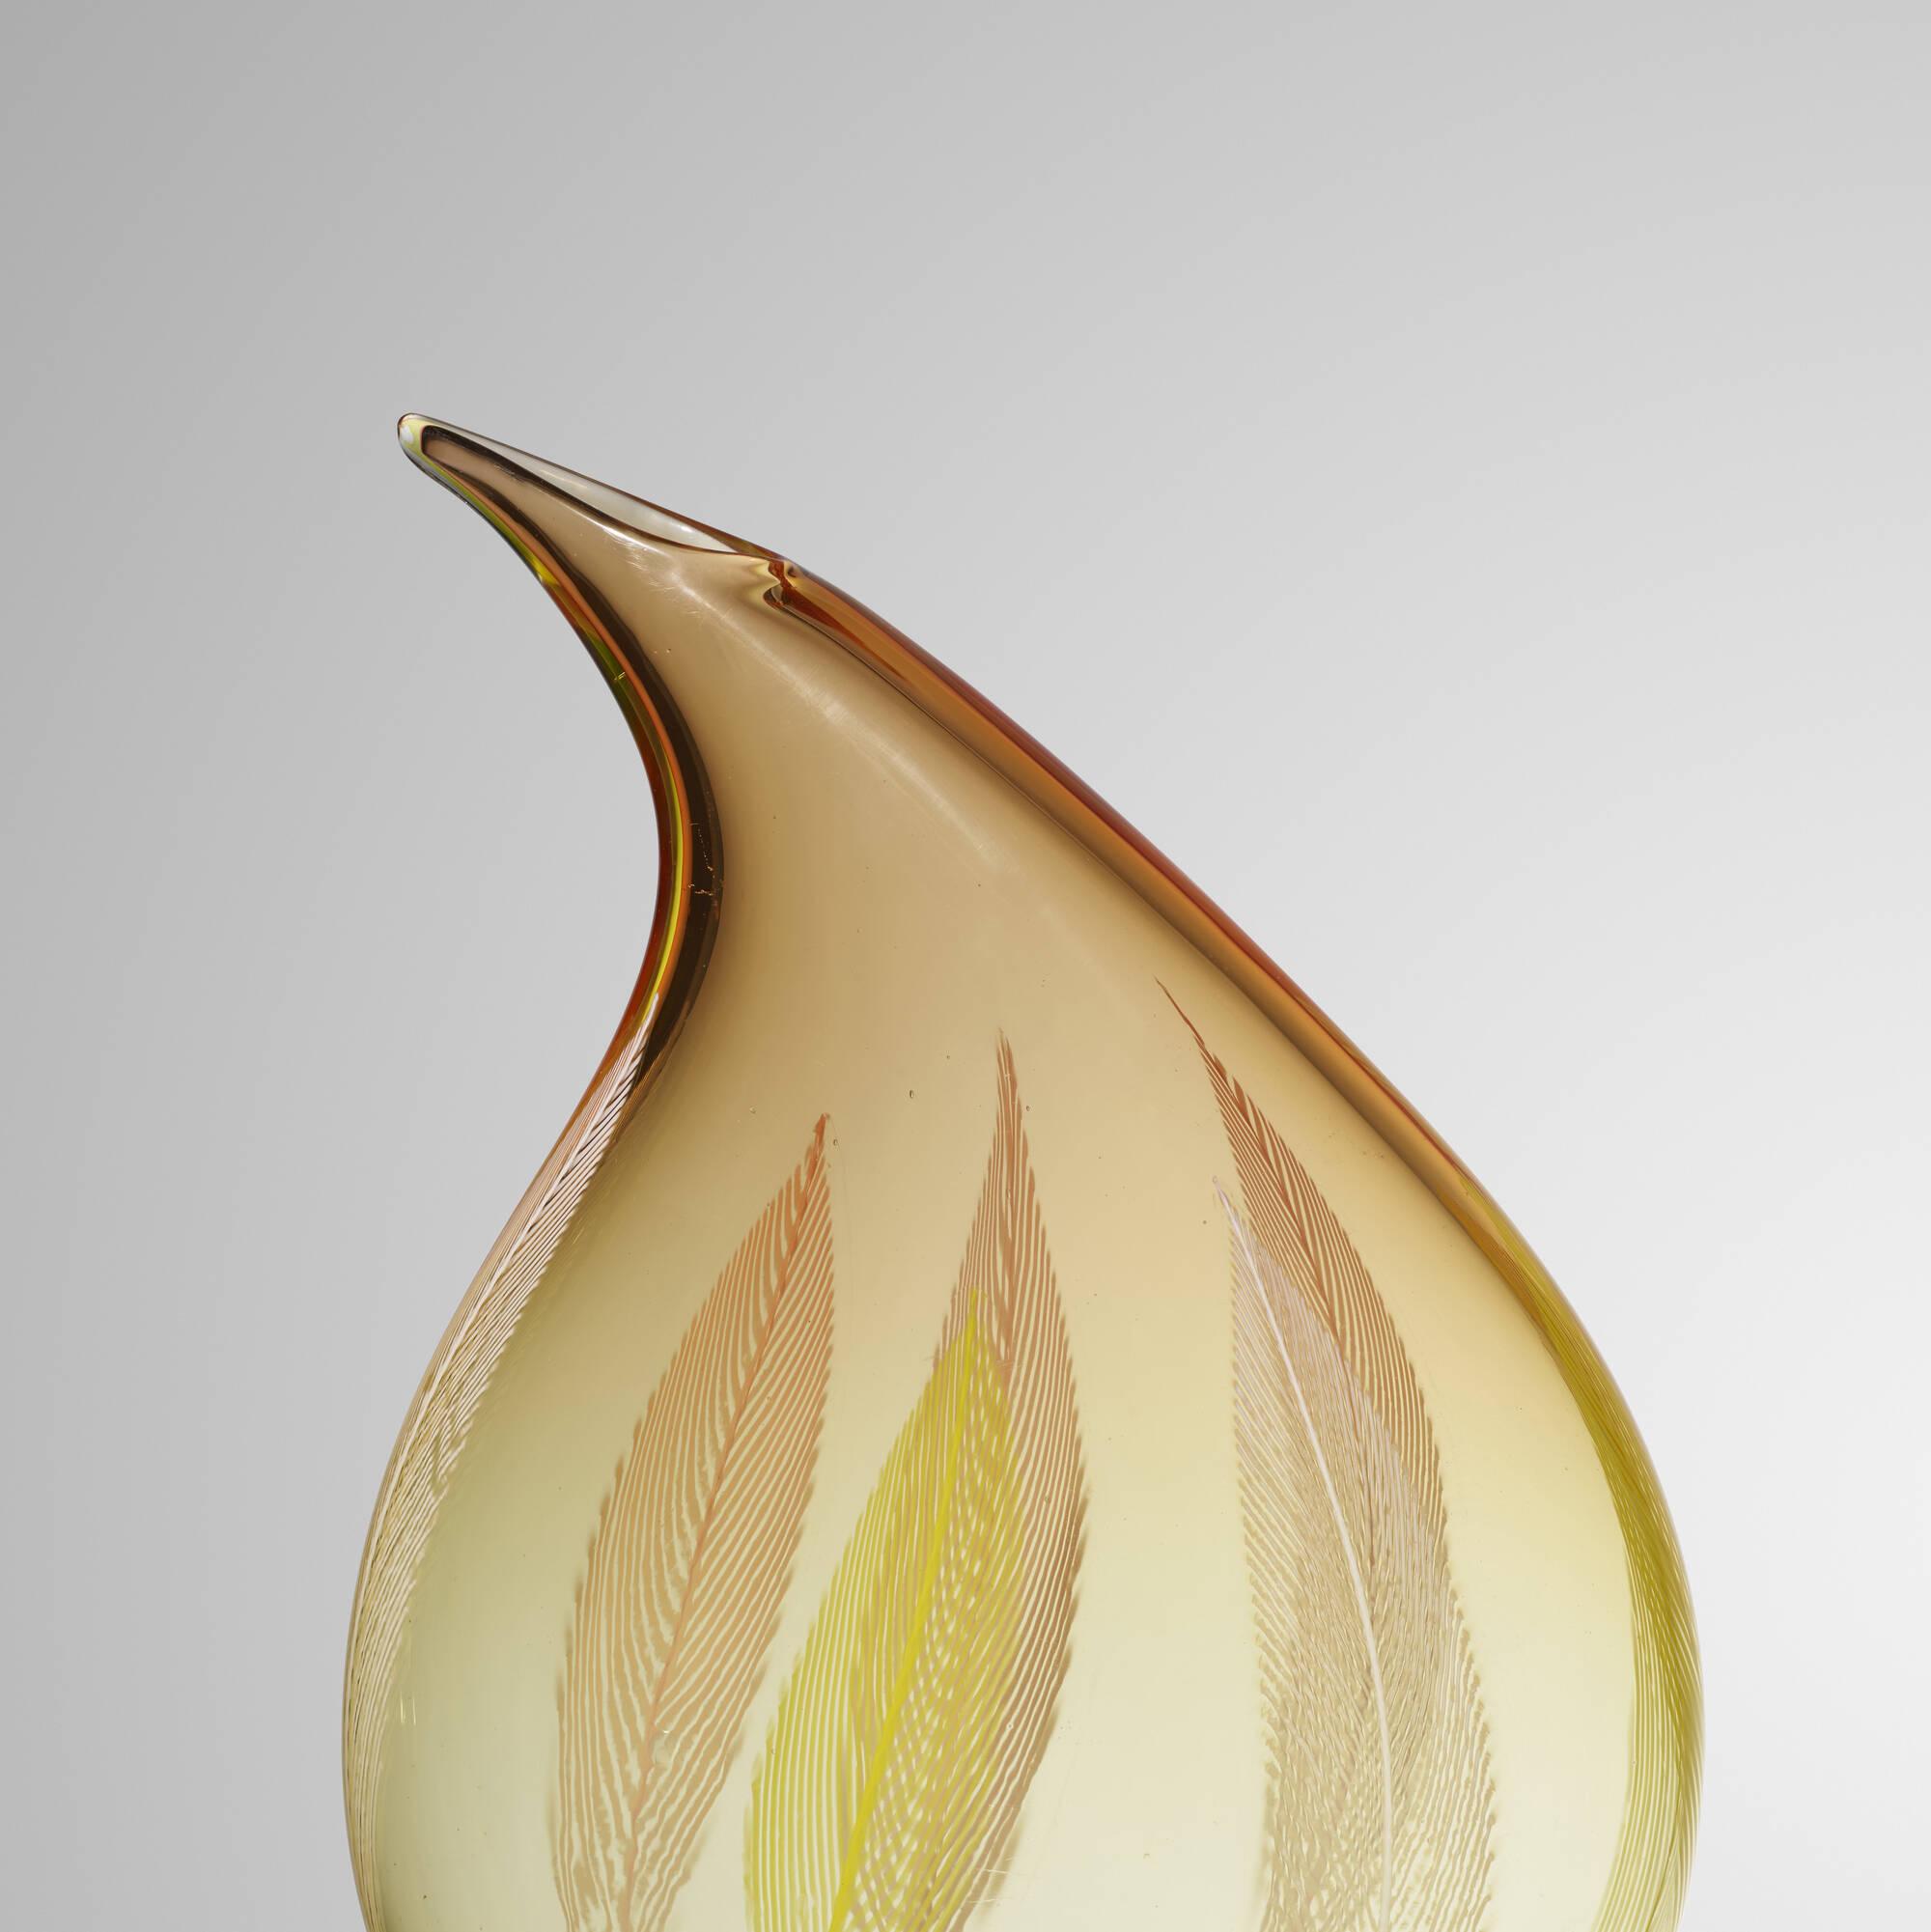 168: Archimede Seguso / A Piume vase (3 of 3)